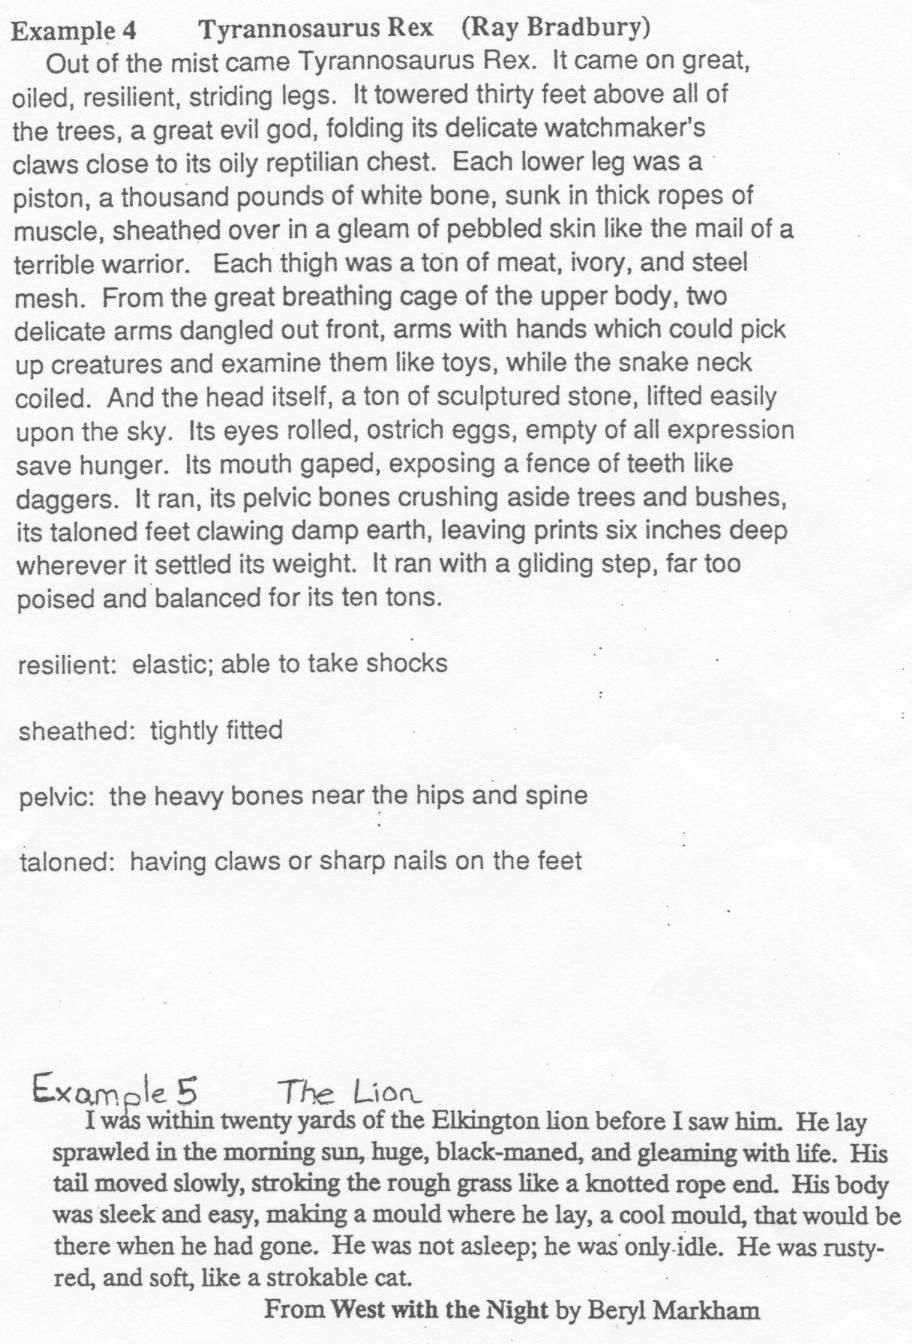 Good Descriptive Essay Examples for All Students